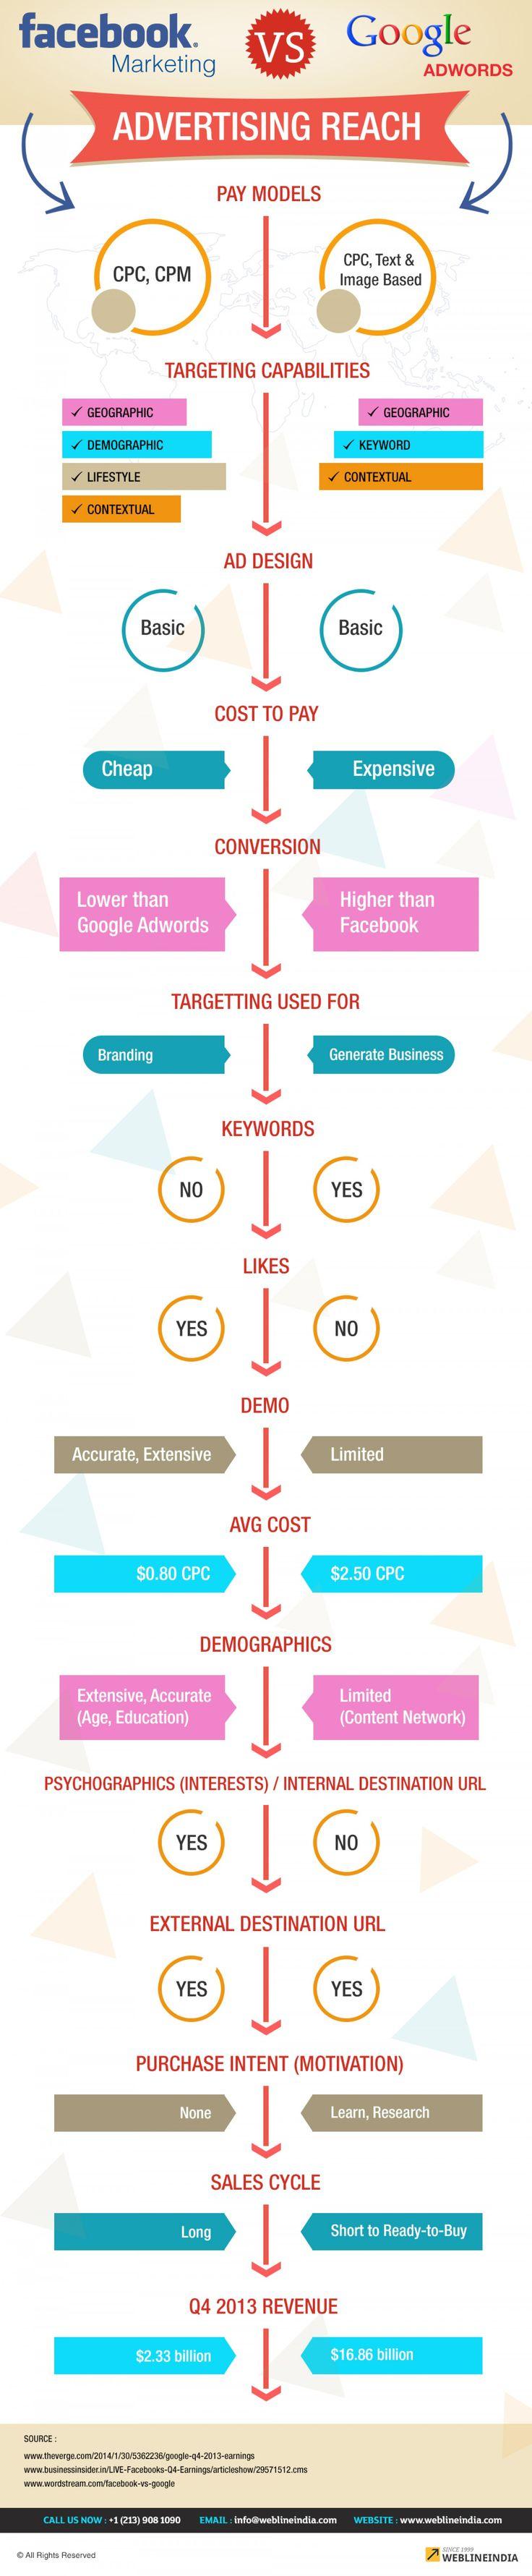 226 best infographics images on pinterest info graphics social facebookmarketing vs googleadwords fandeluxe Image collections